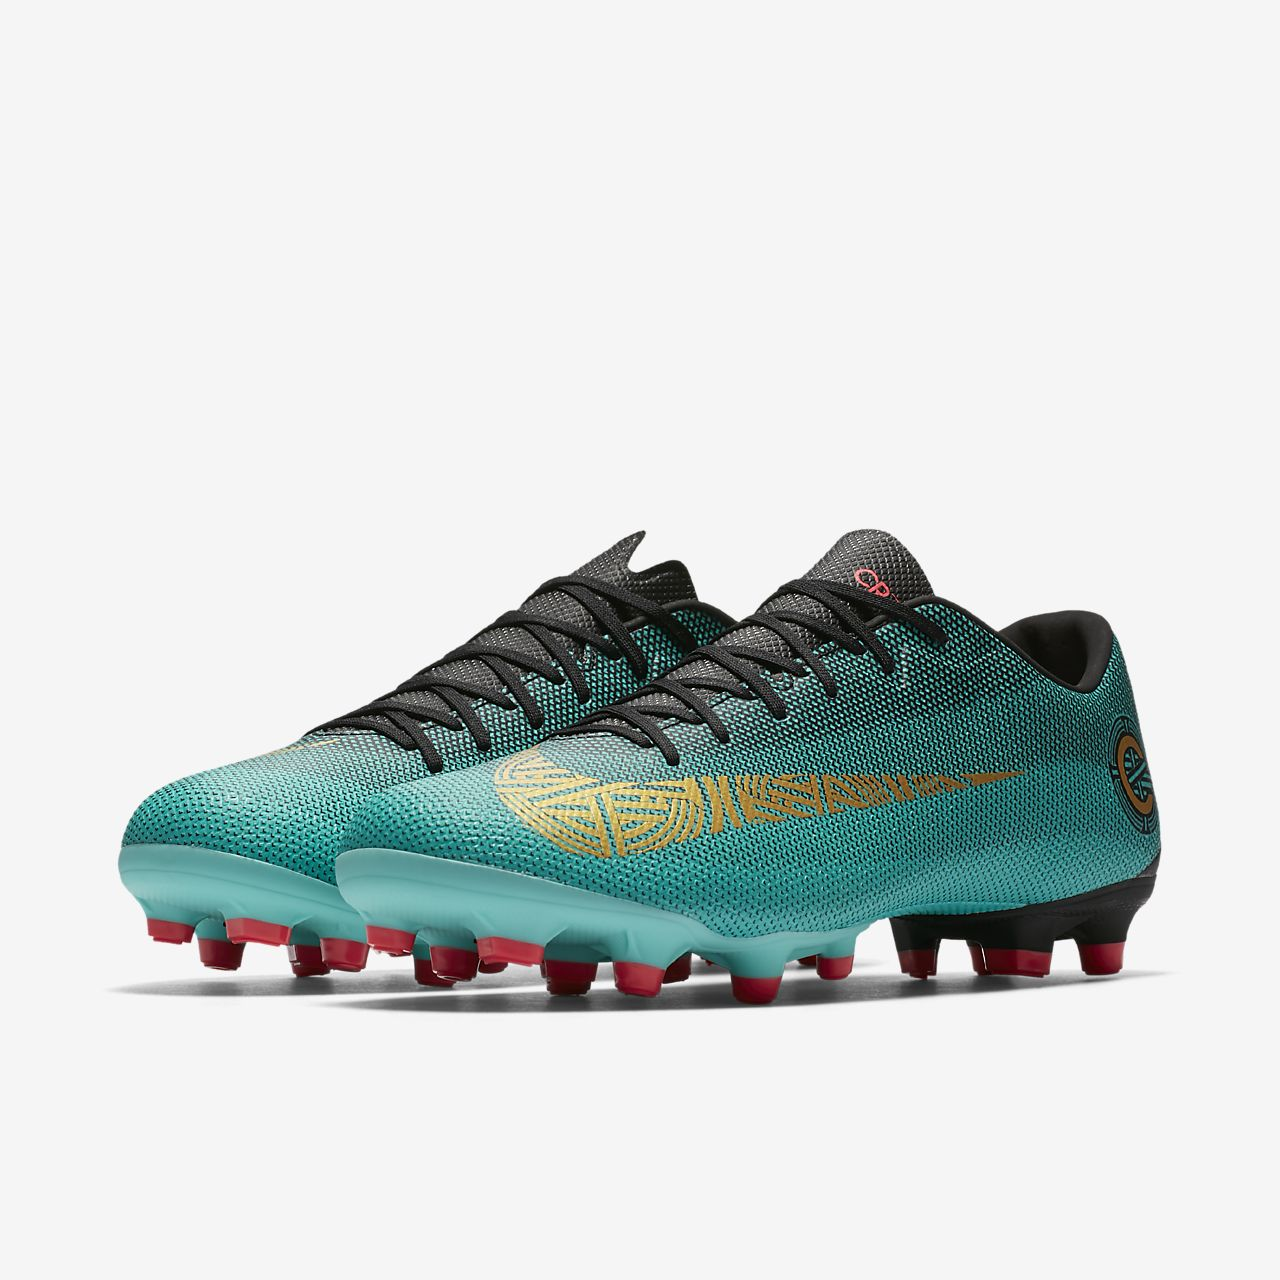 sports shoes 24ee2 242f1 Chaussure de football multi,terrains à crampons Nike Mercurial Vapor XII  Academy CR7 ...